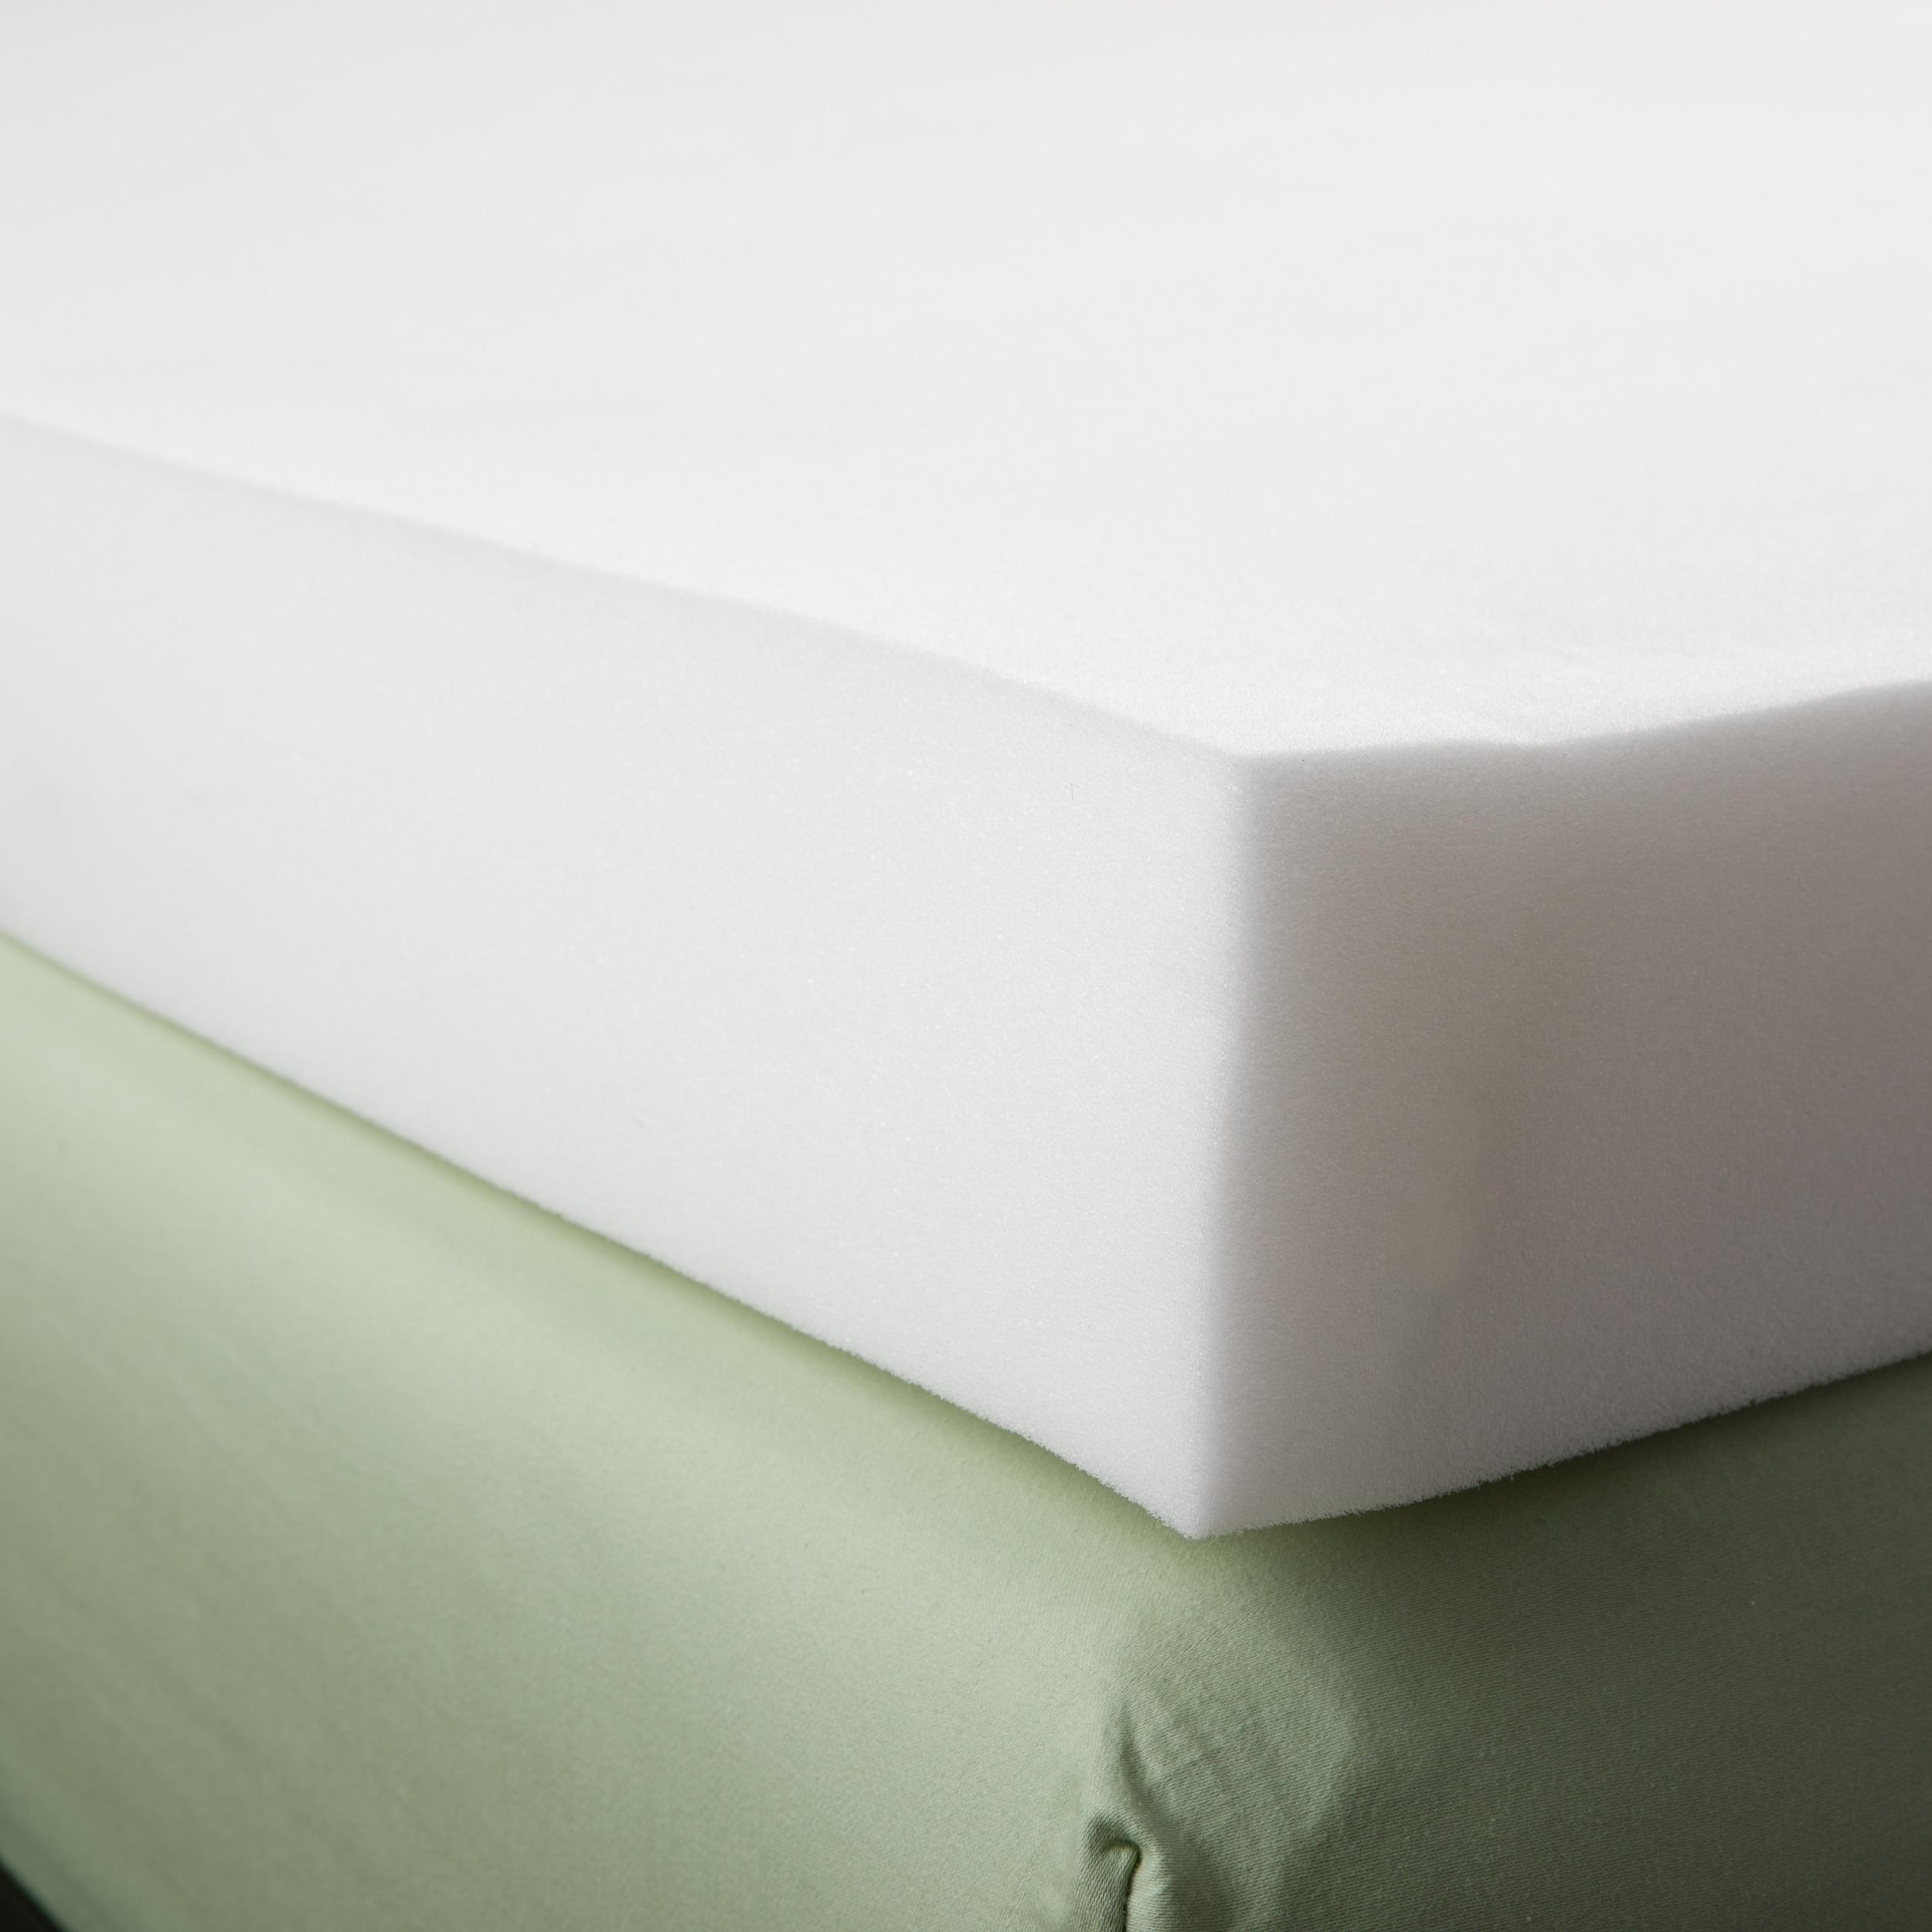 tri soft topper removable ultra product milliard slip mattress fold inch cover non bottom with single foam x